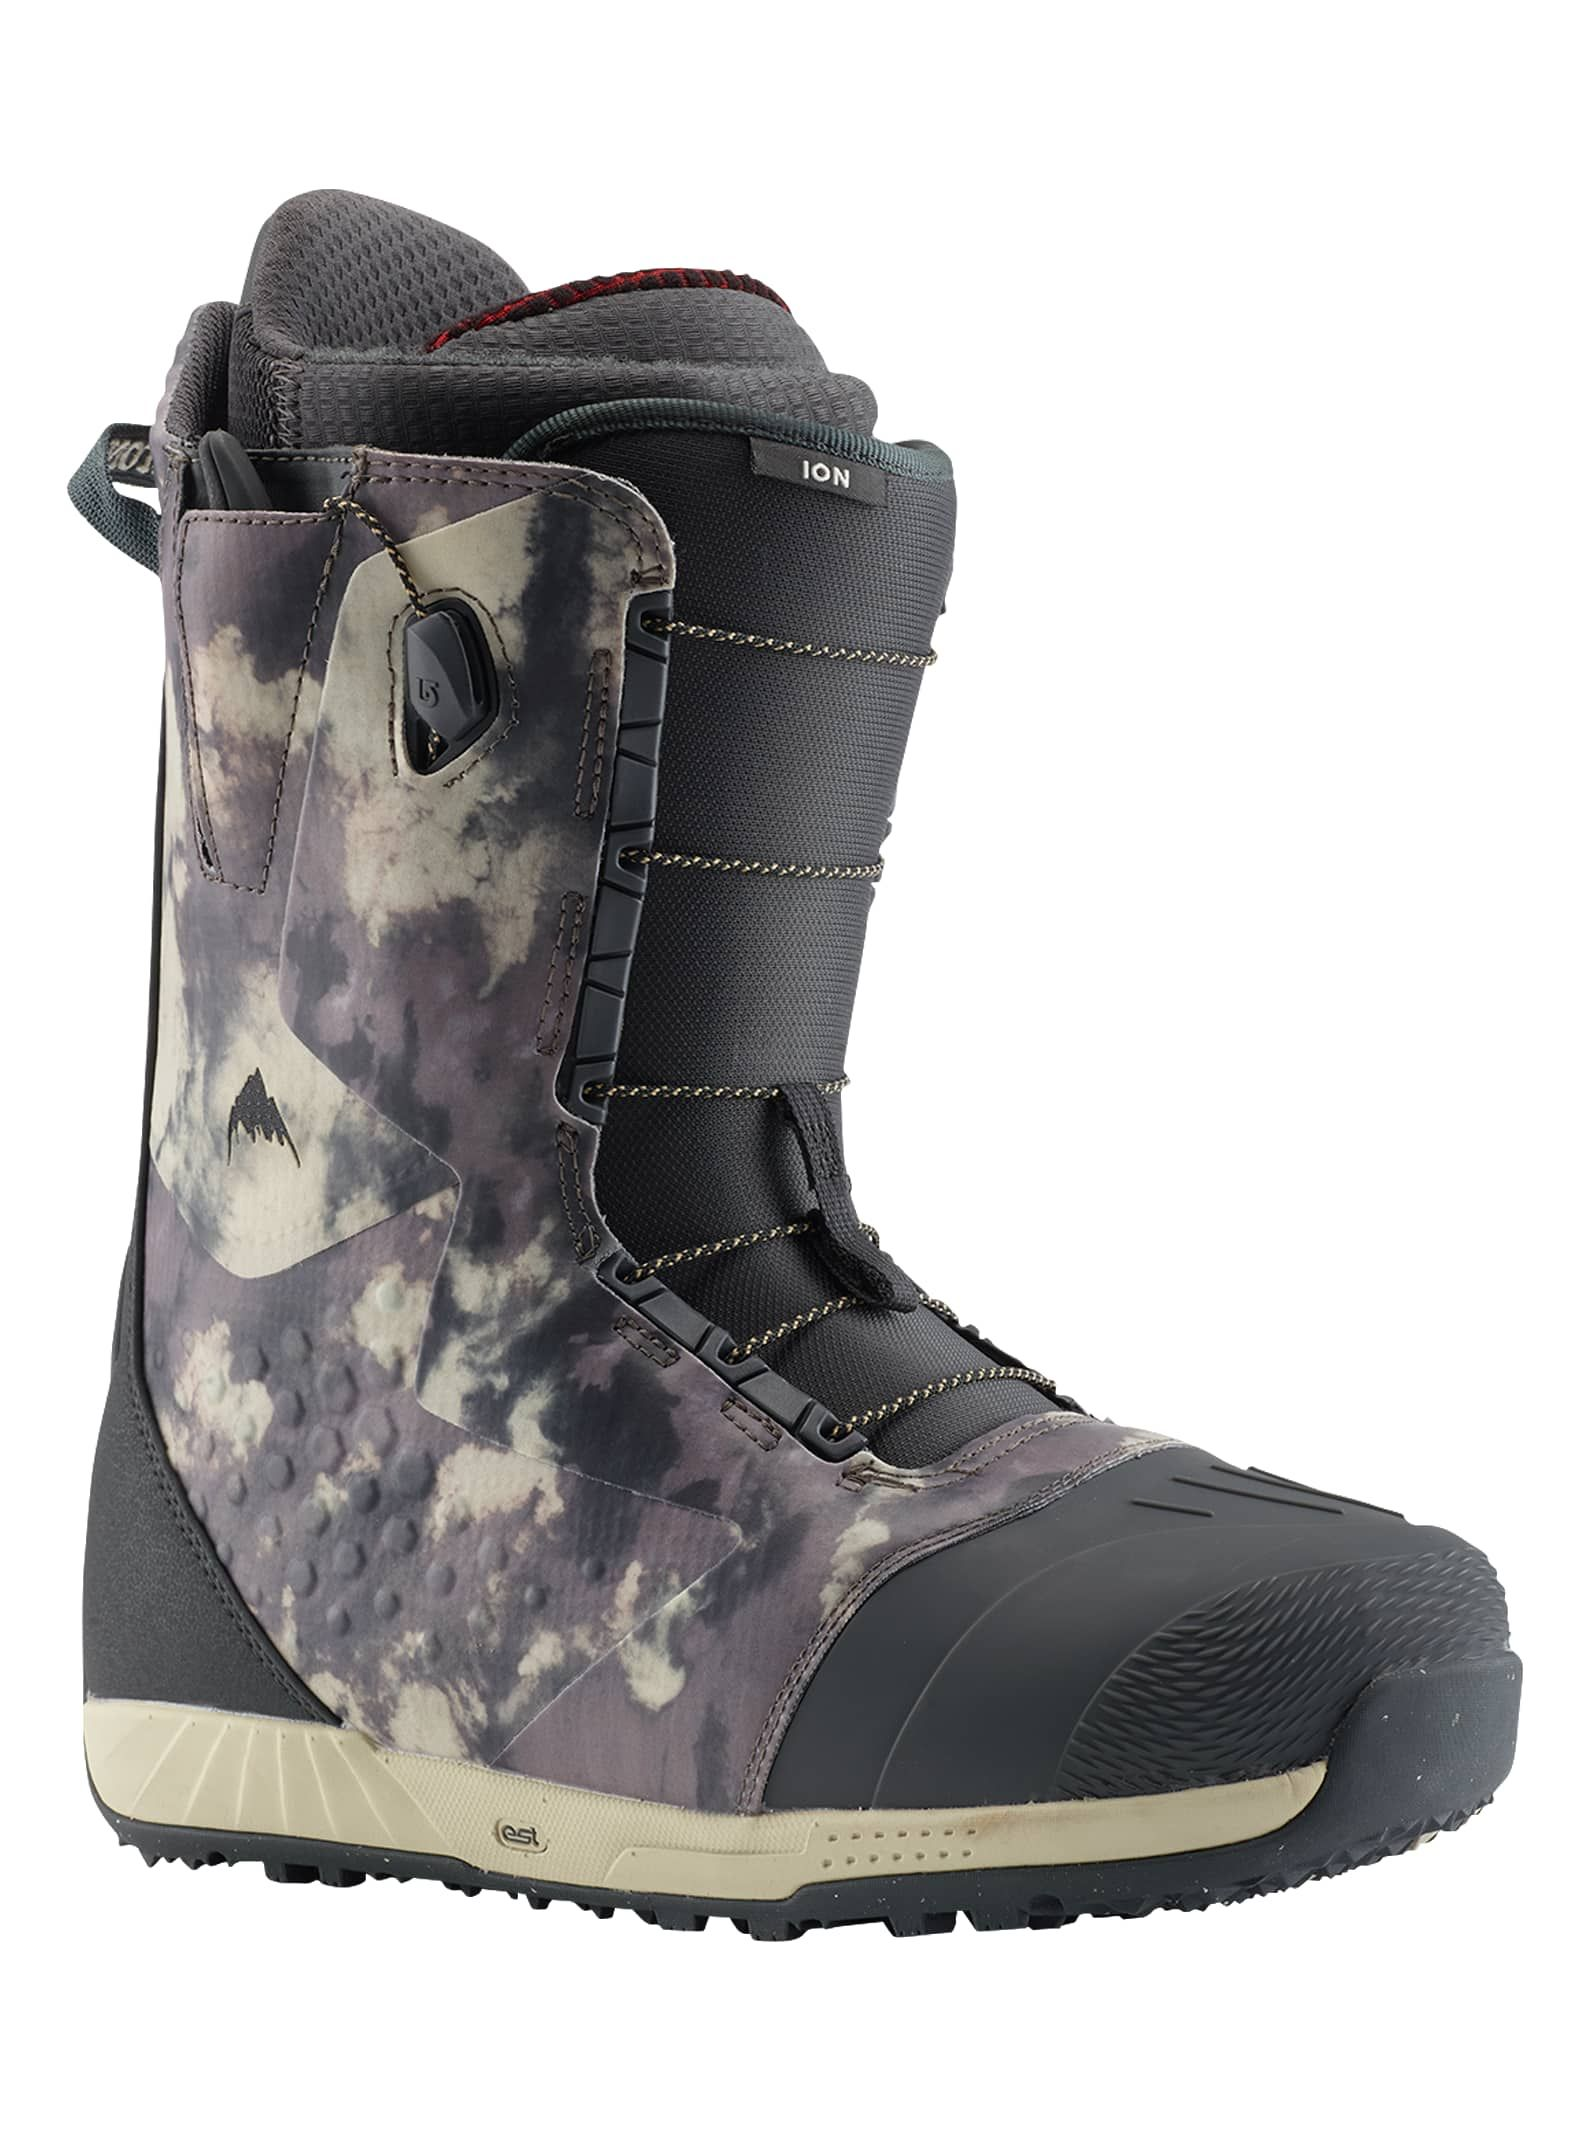 promo code 43955 88c72 Men s Burton Ion Snowboard Boot